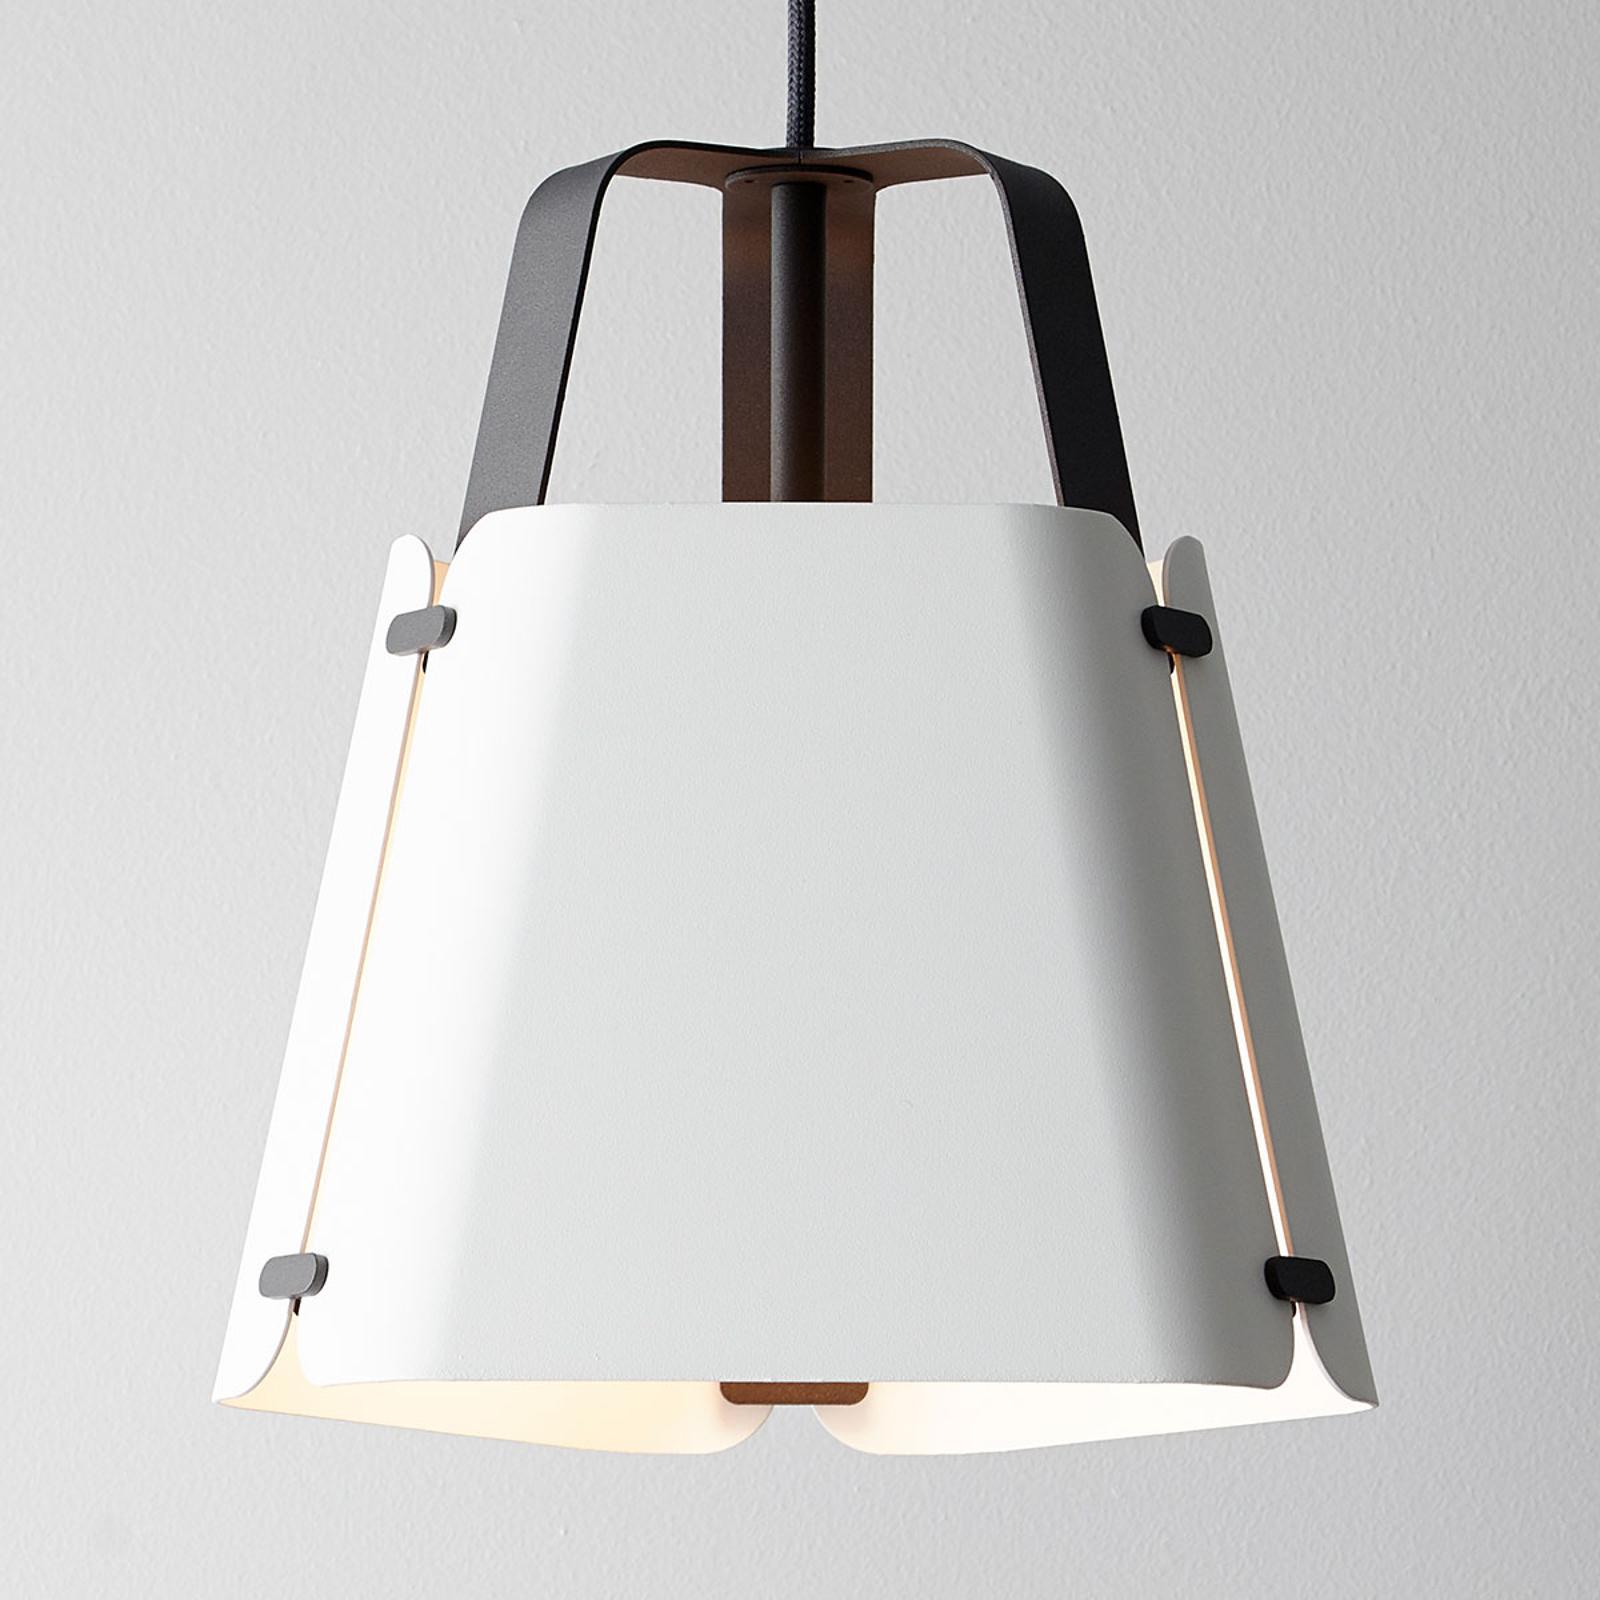 Lampa wisząca Wrap, biała, 27,5 cm